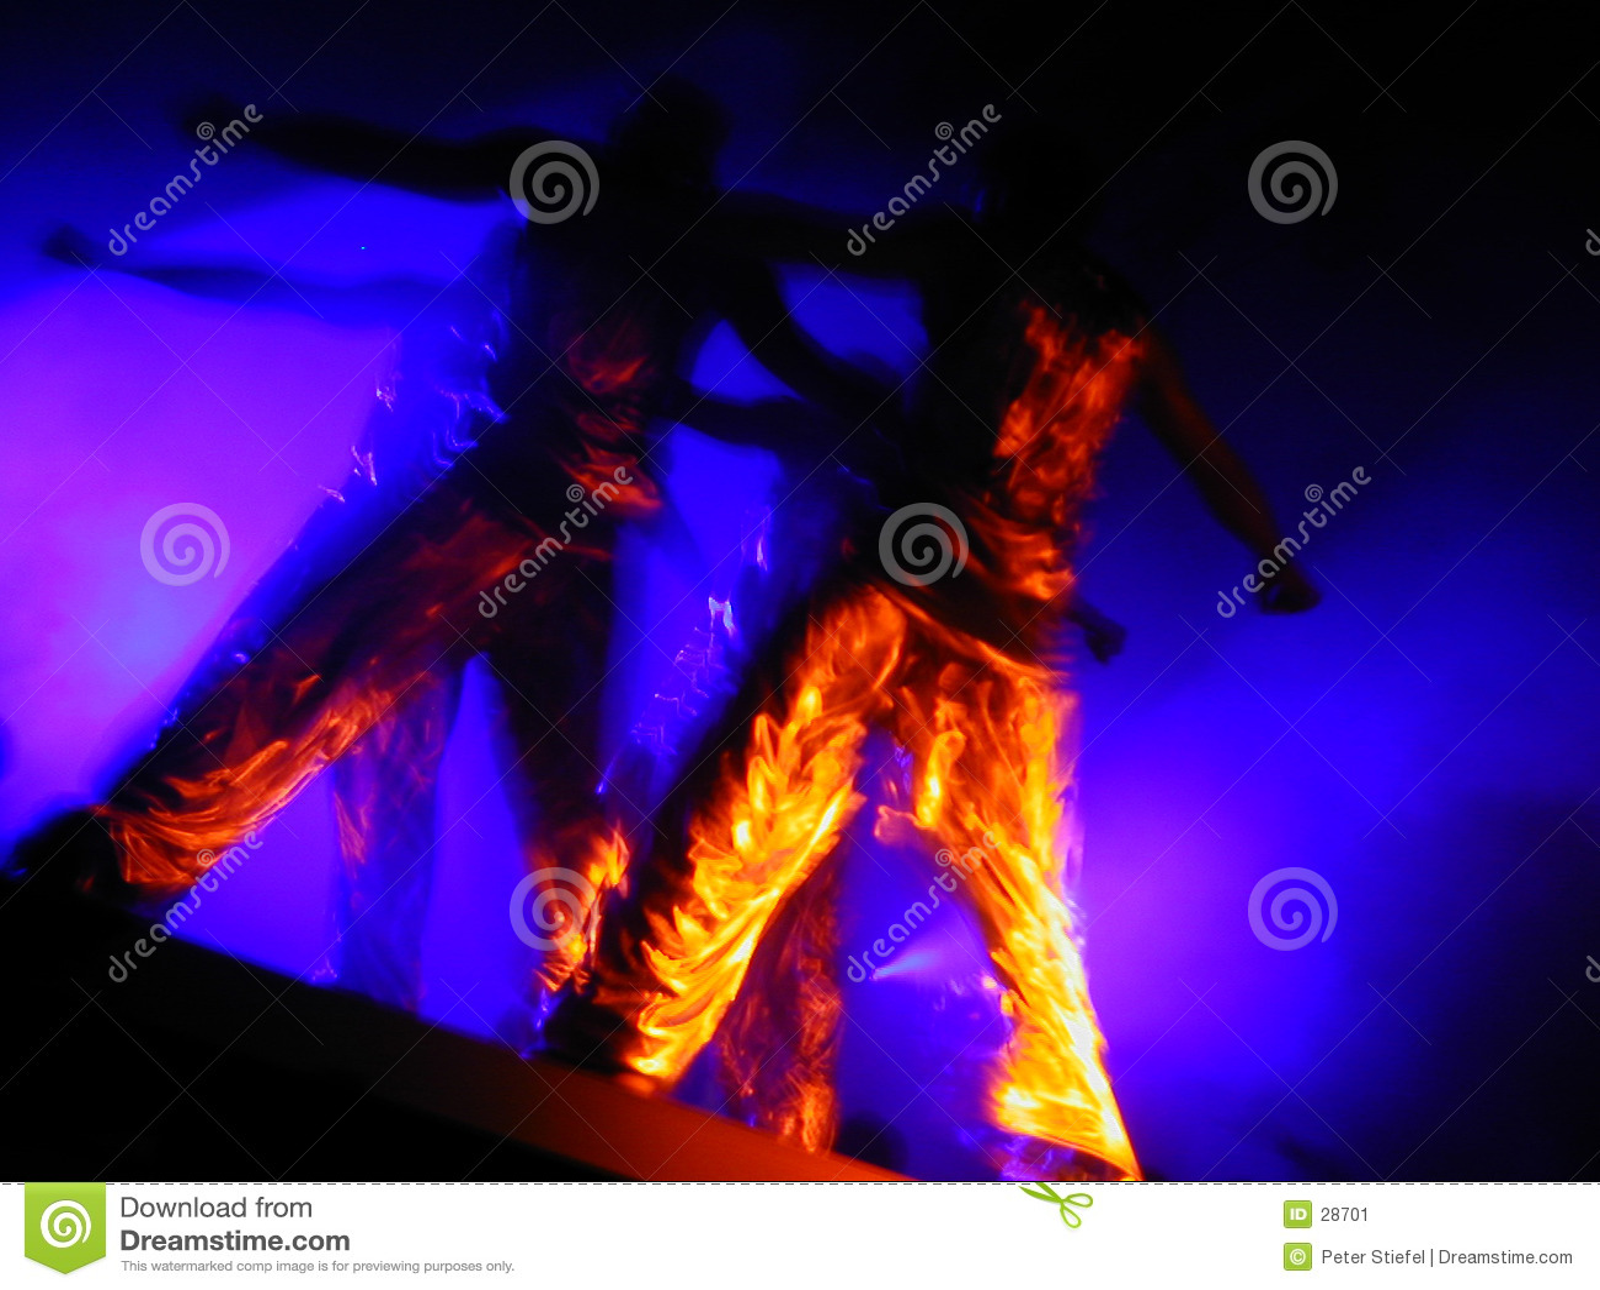 Liquid gold dance performers